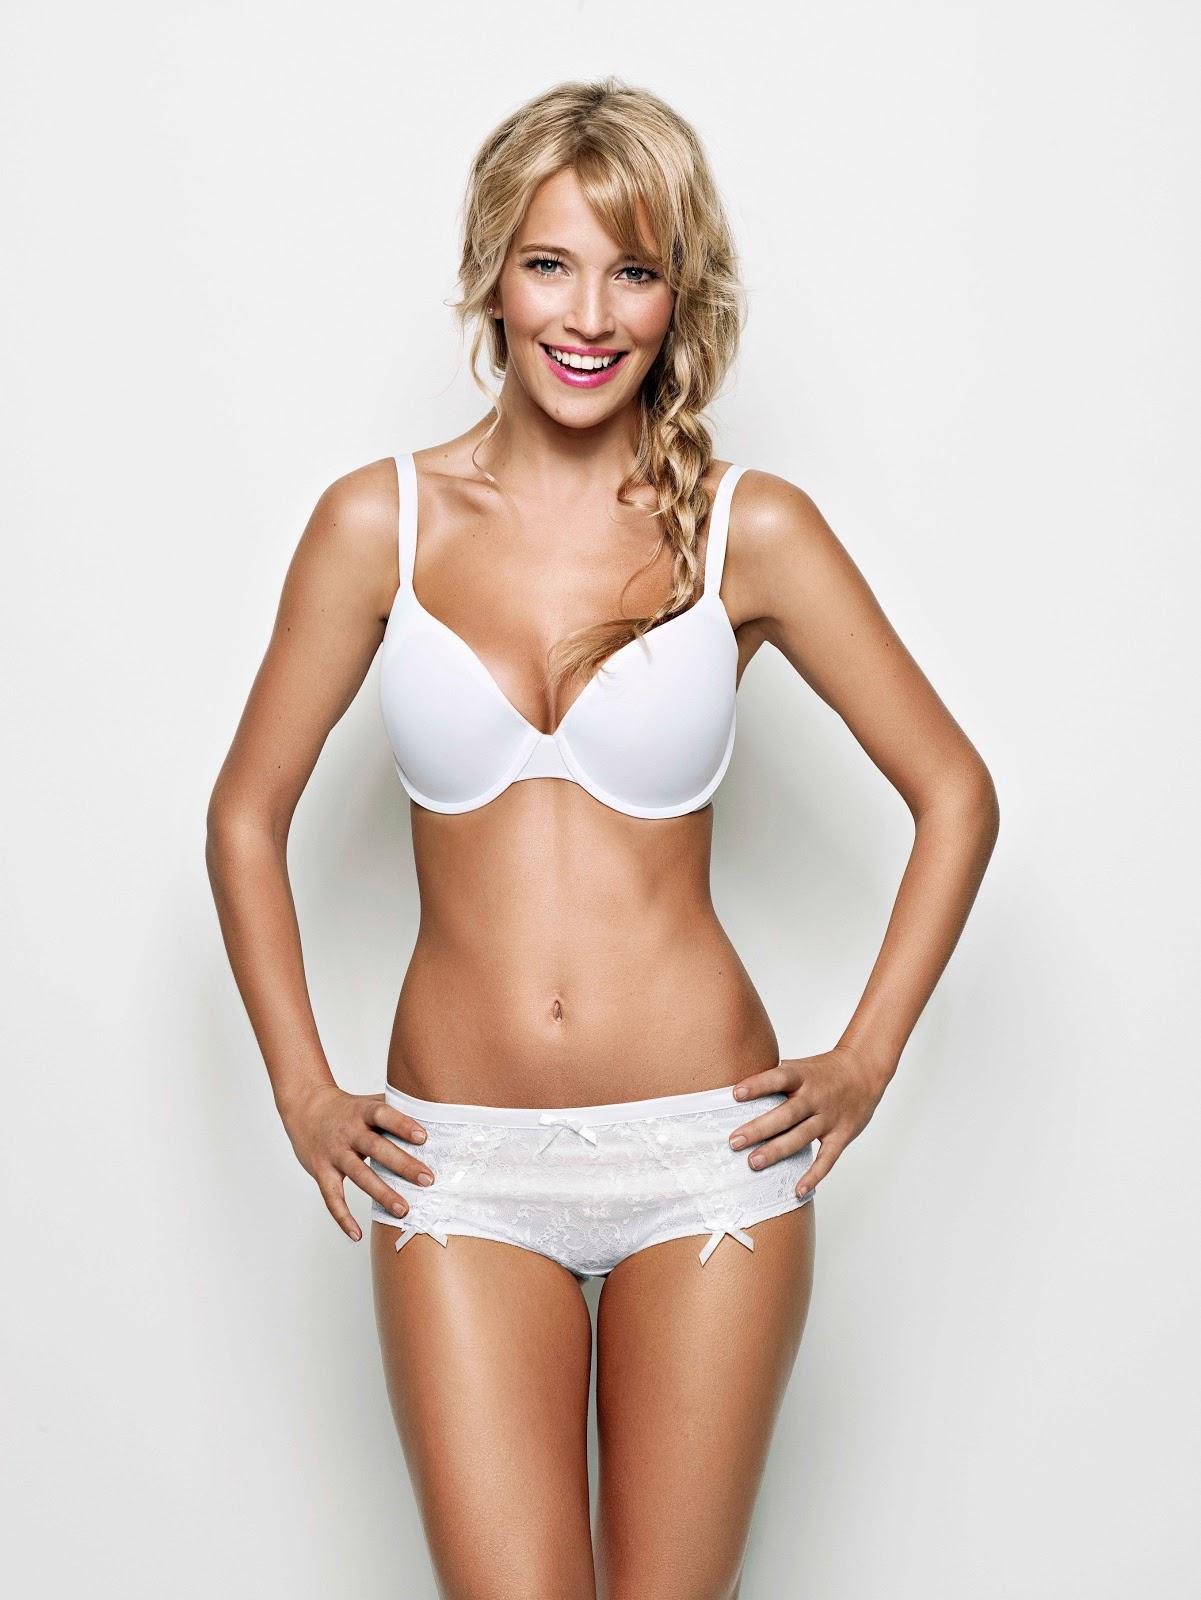 http://4.bp.blogspot.com/-zR2iZhrlNZo/TwFK063m9oI/AAAAAAAAI4o/0-5d00Xg3H8/s1600/bikini+trend_18.jpg